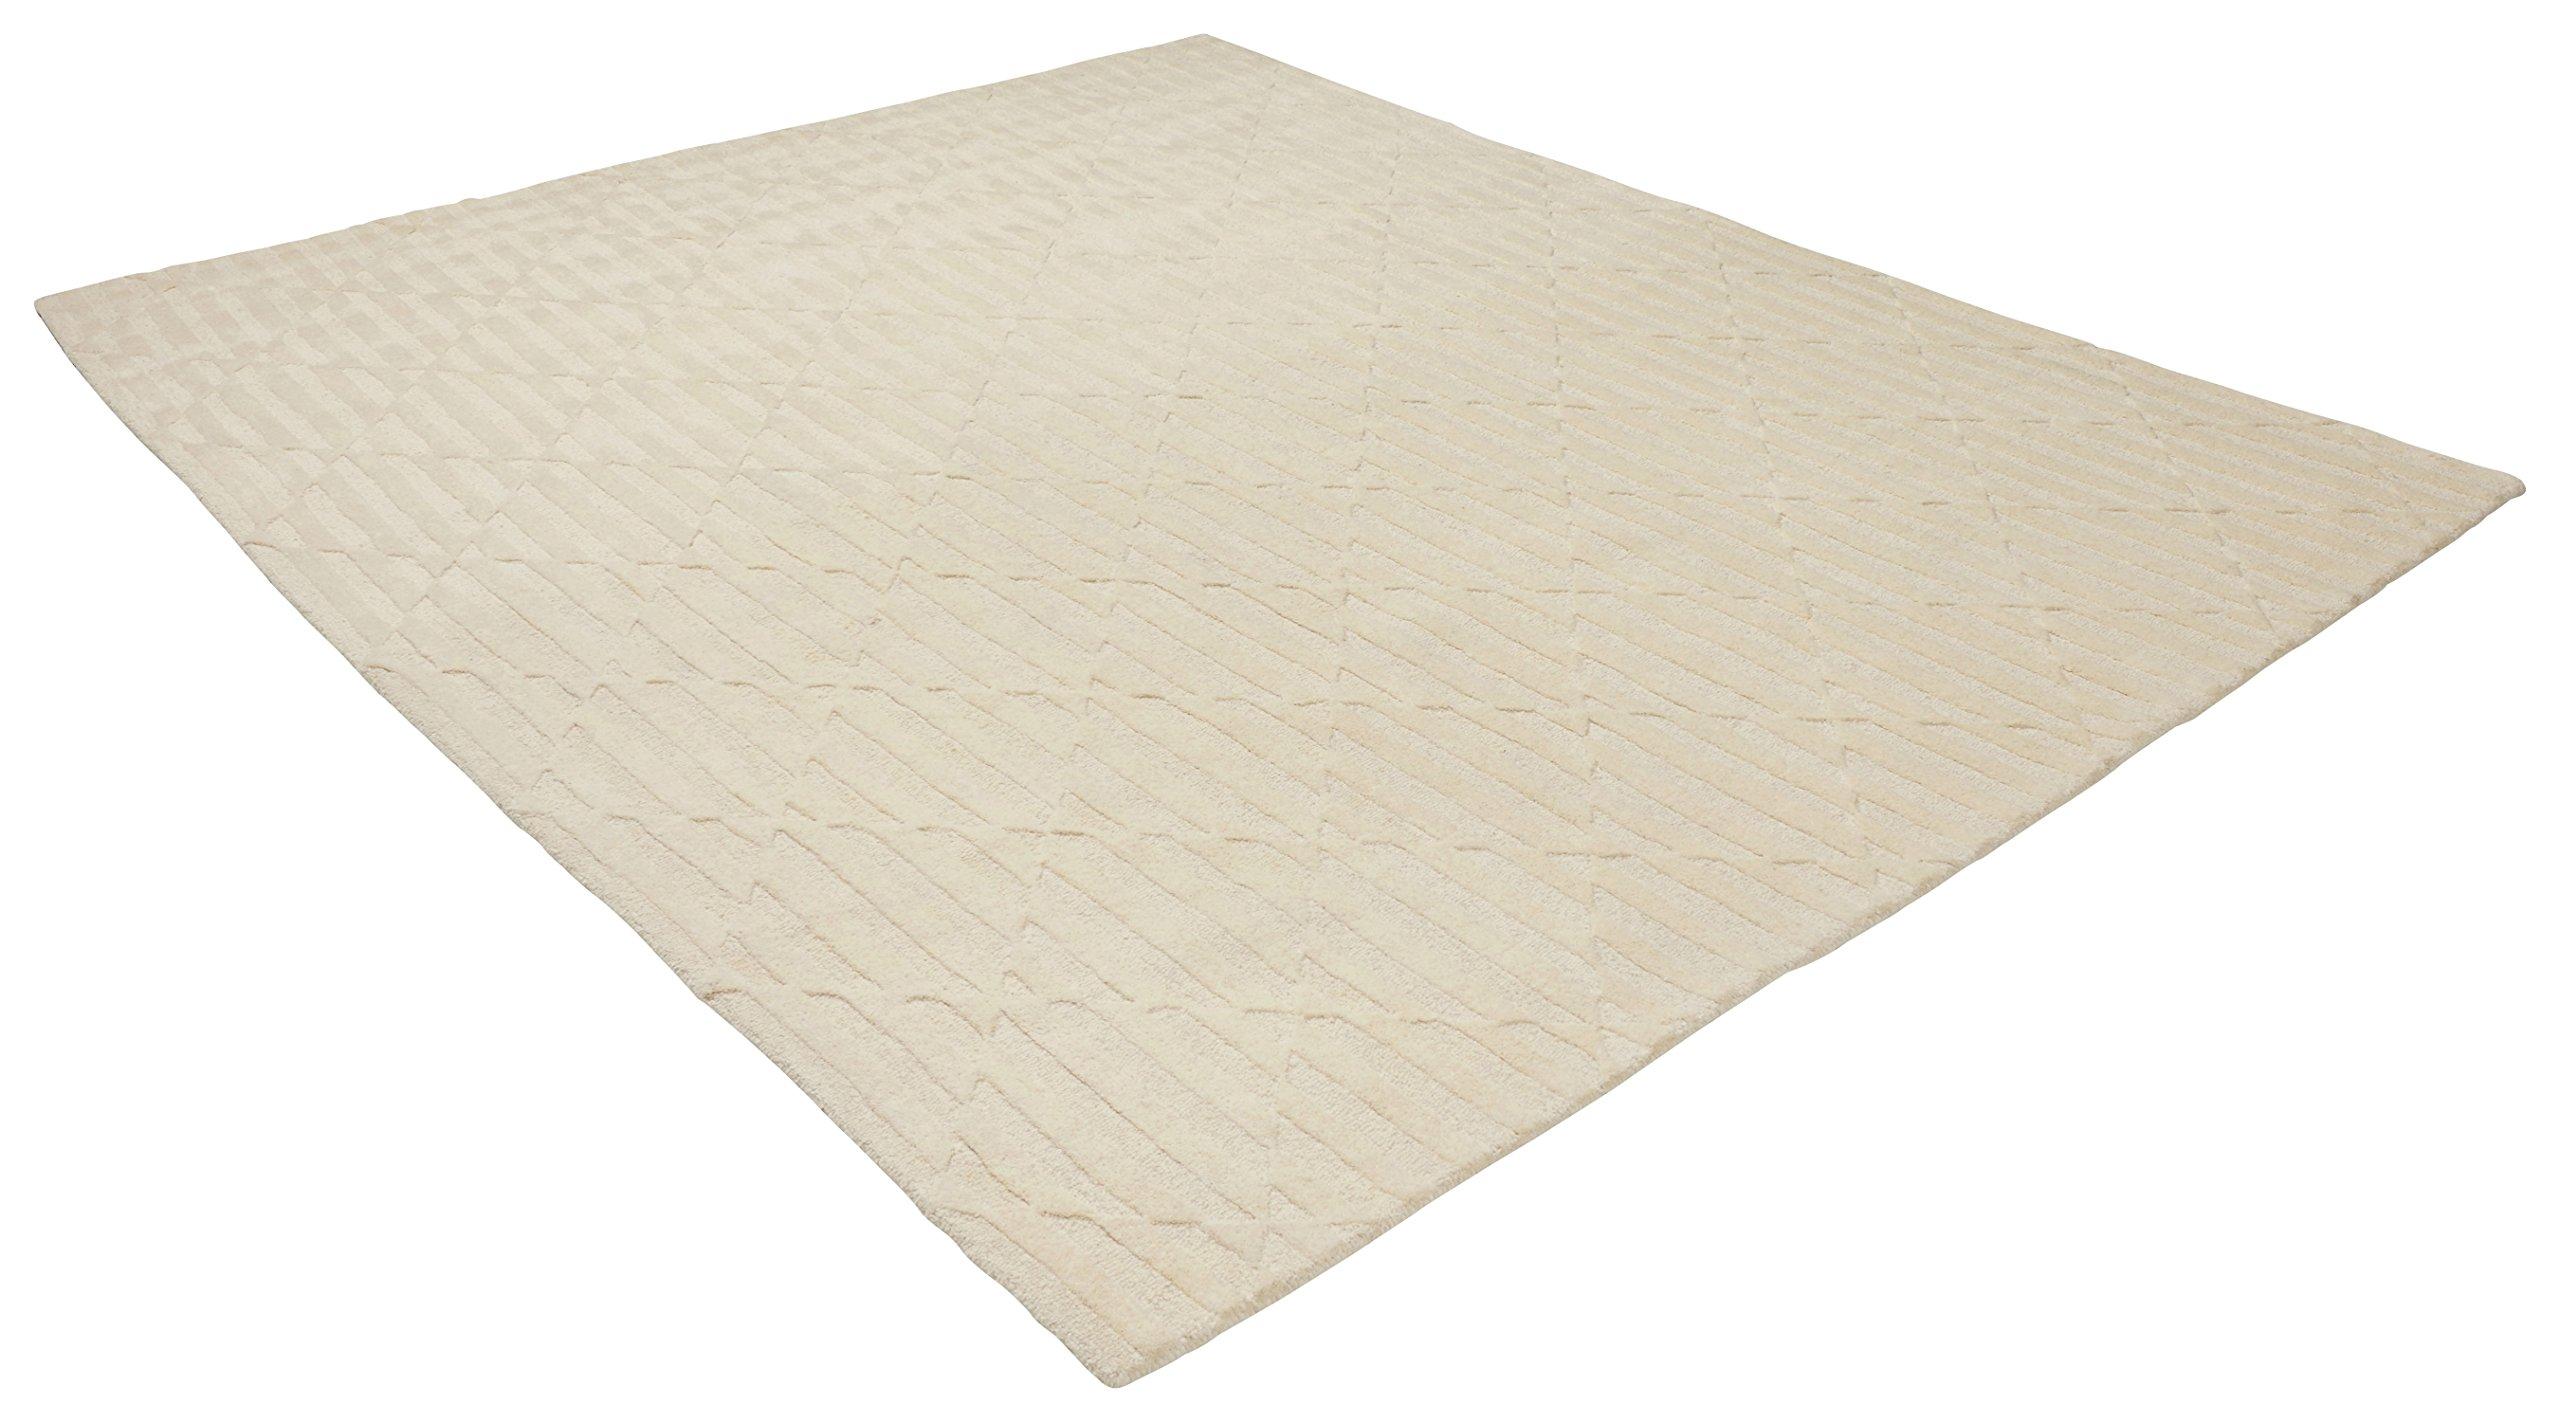 Rivet Geometric Criss-Cross Woven Wool Area Rug, 8' x 10', Cream by Rivet (Image #4)